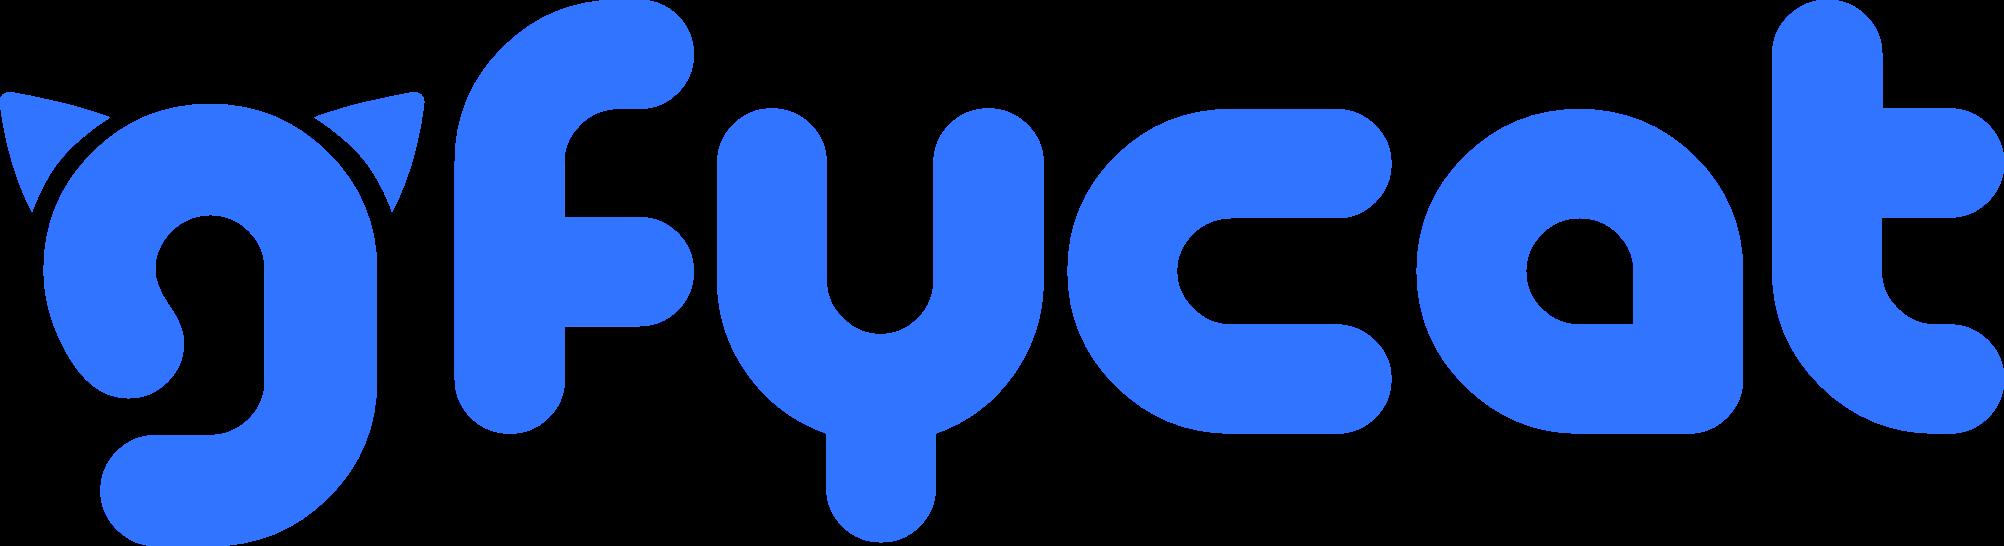 logo gfycat